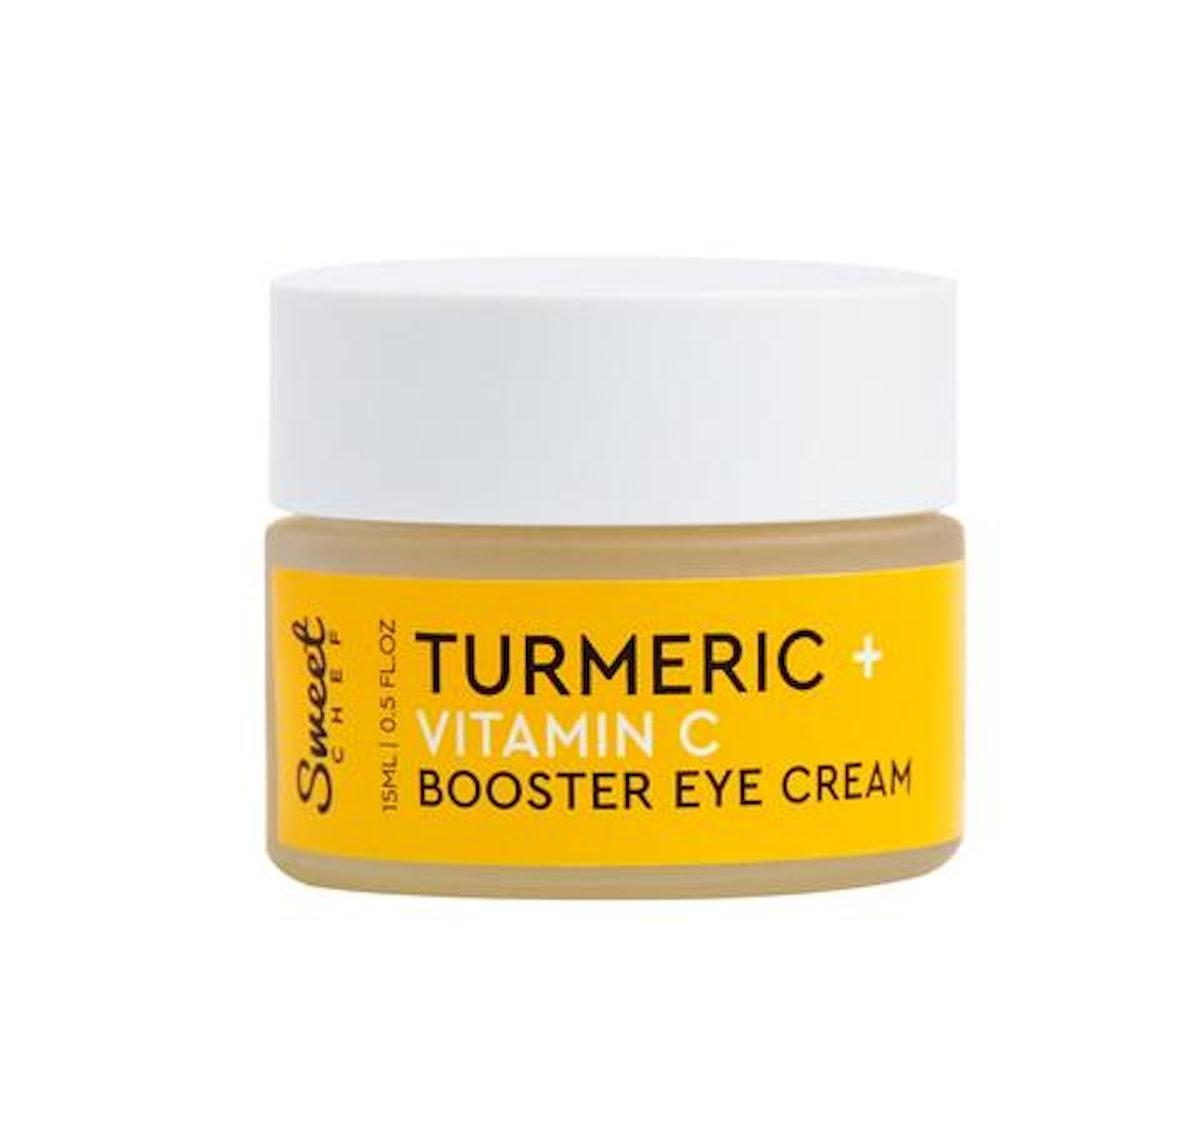 Sweet Chef Tumeric + Vitamin C Booster Eye Cream